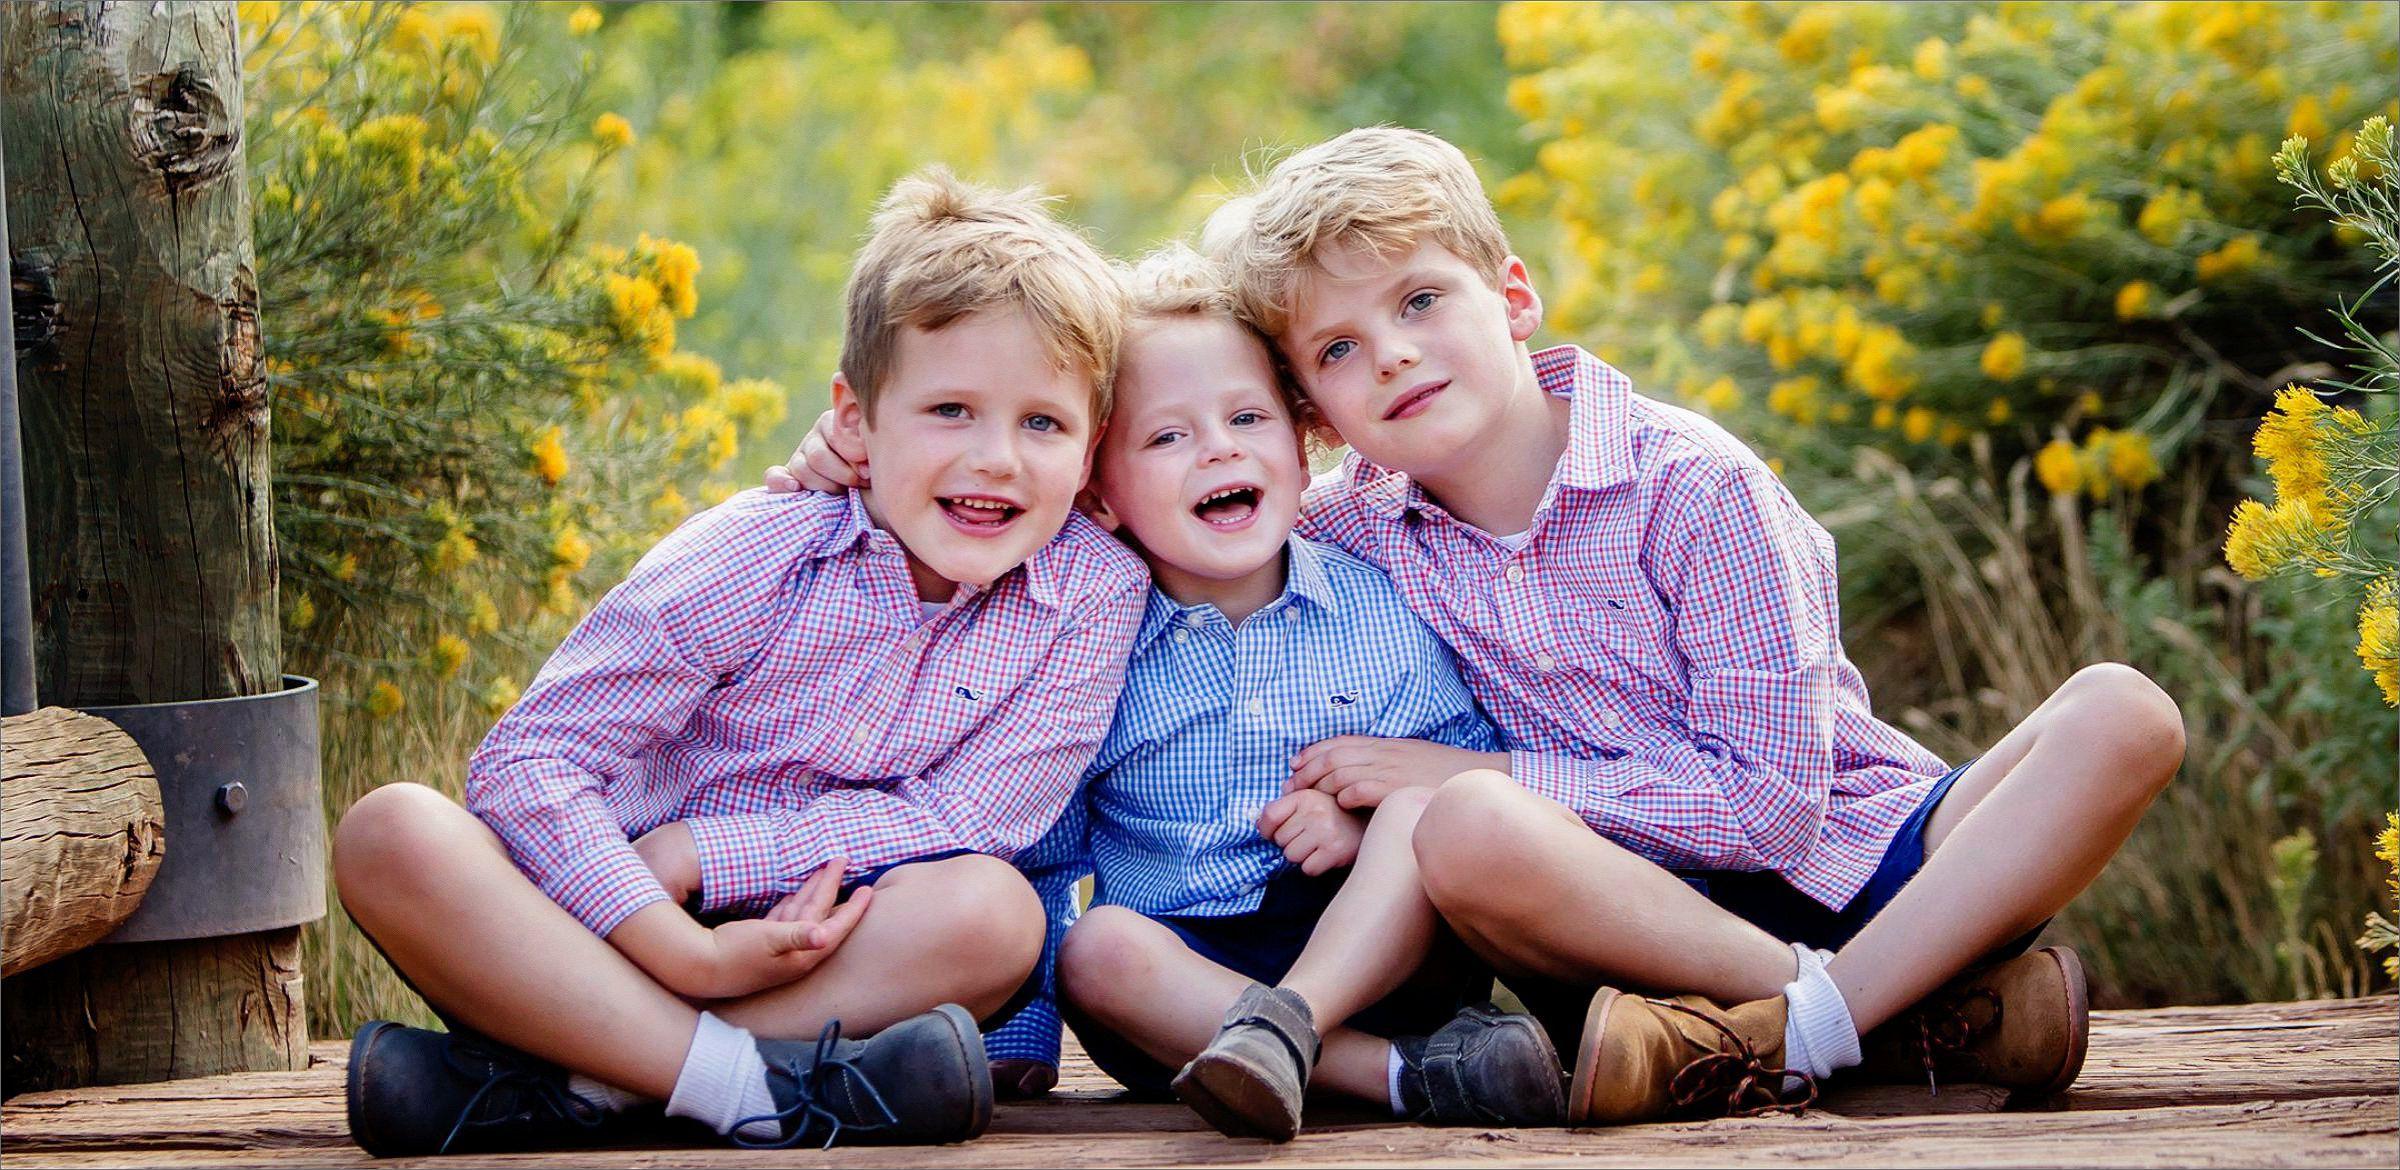 Colorado Children's Photography